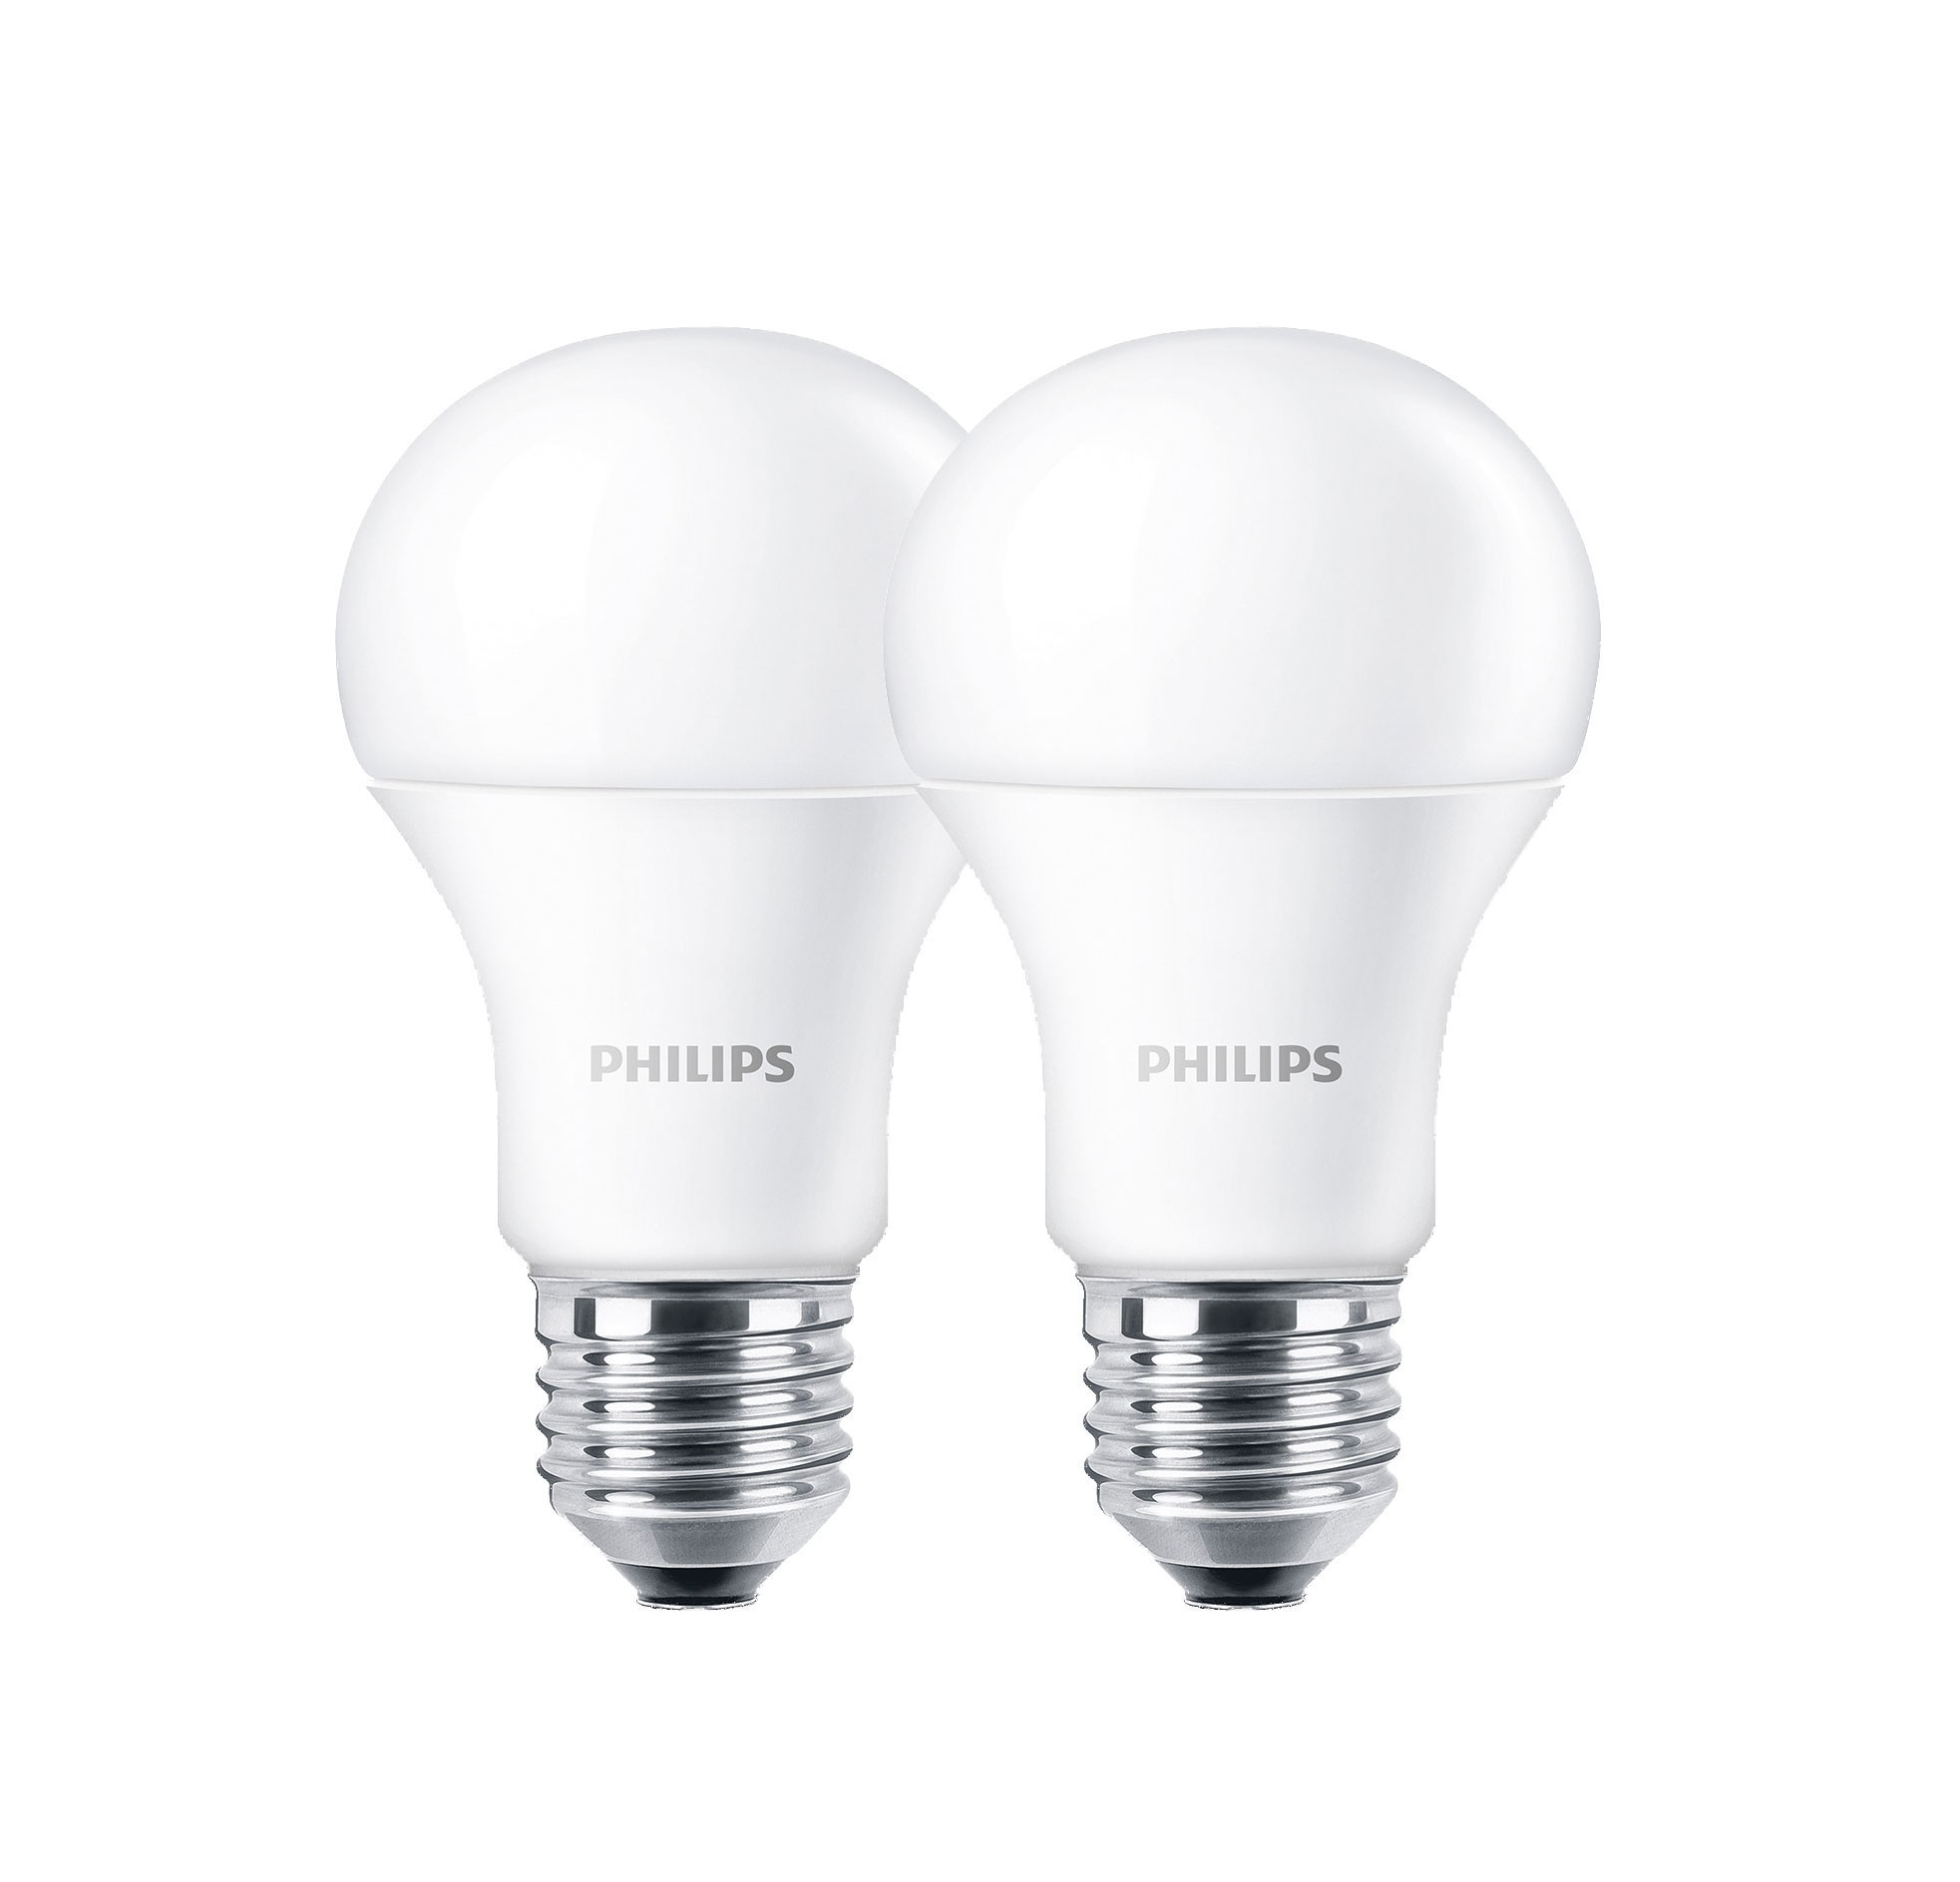 Philips LED-Normallampe E27 9 Watt 2 Stück Bild 1